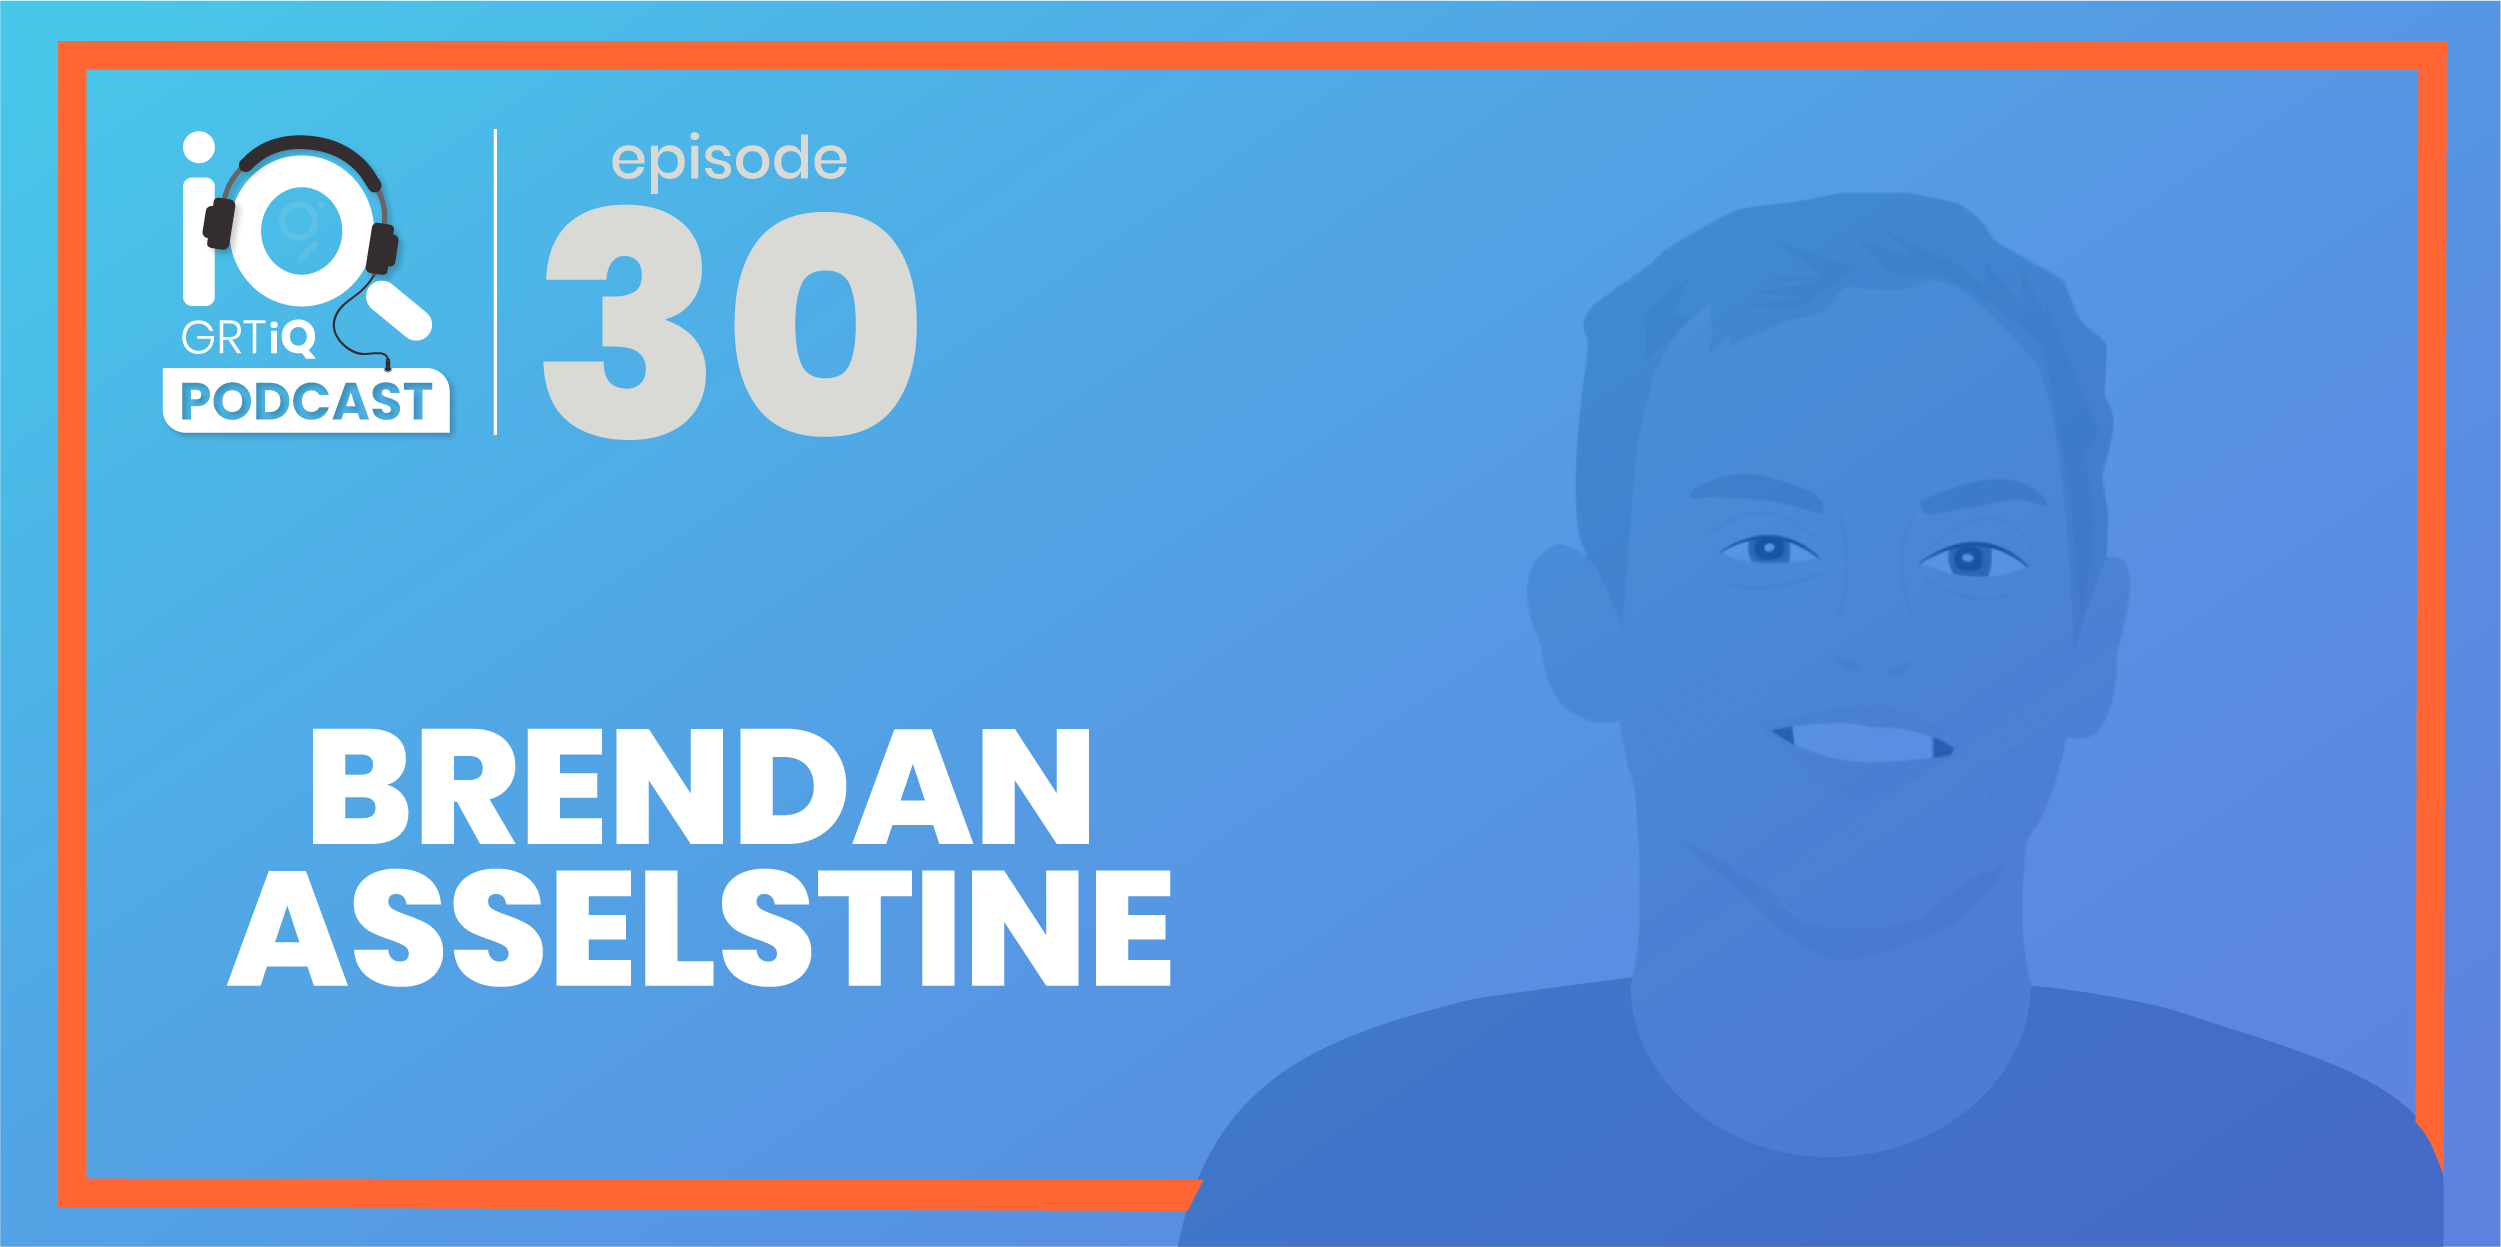 Brendan Asselstine PoolTogether Curator Delegator The Graph CTO Crypto Blockchain no-loss prize games